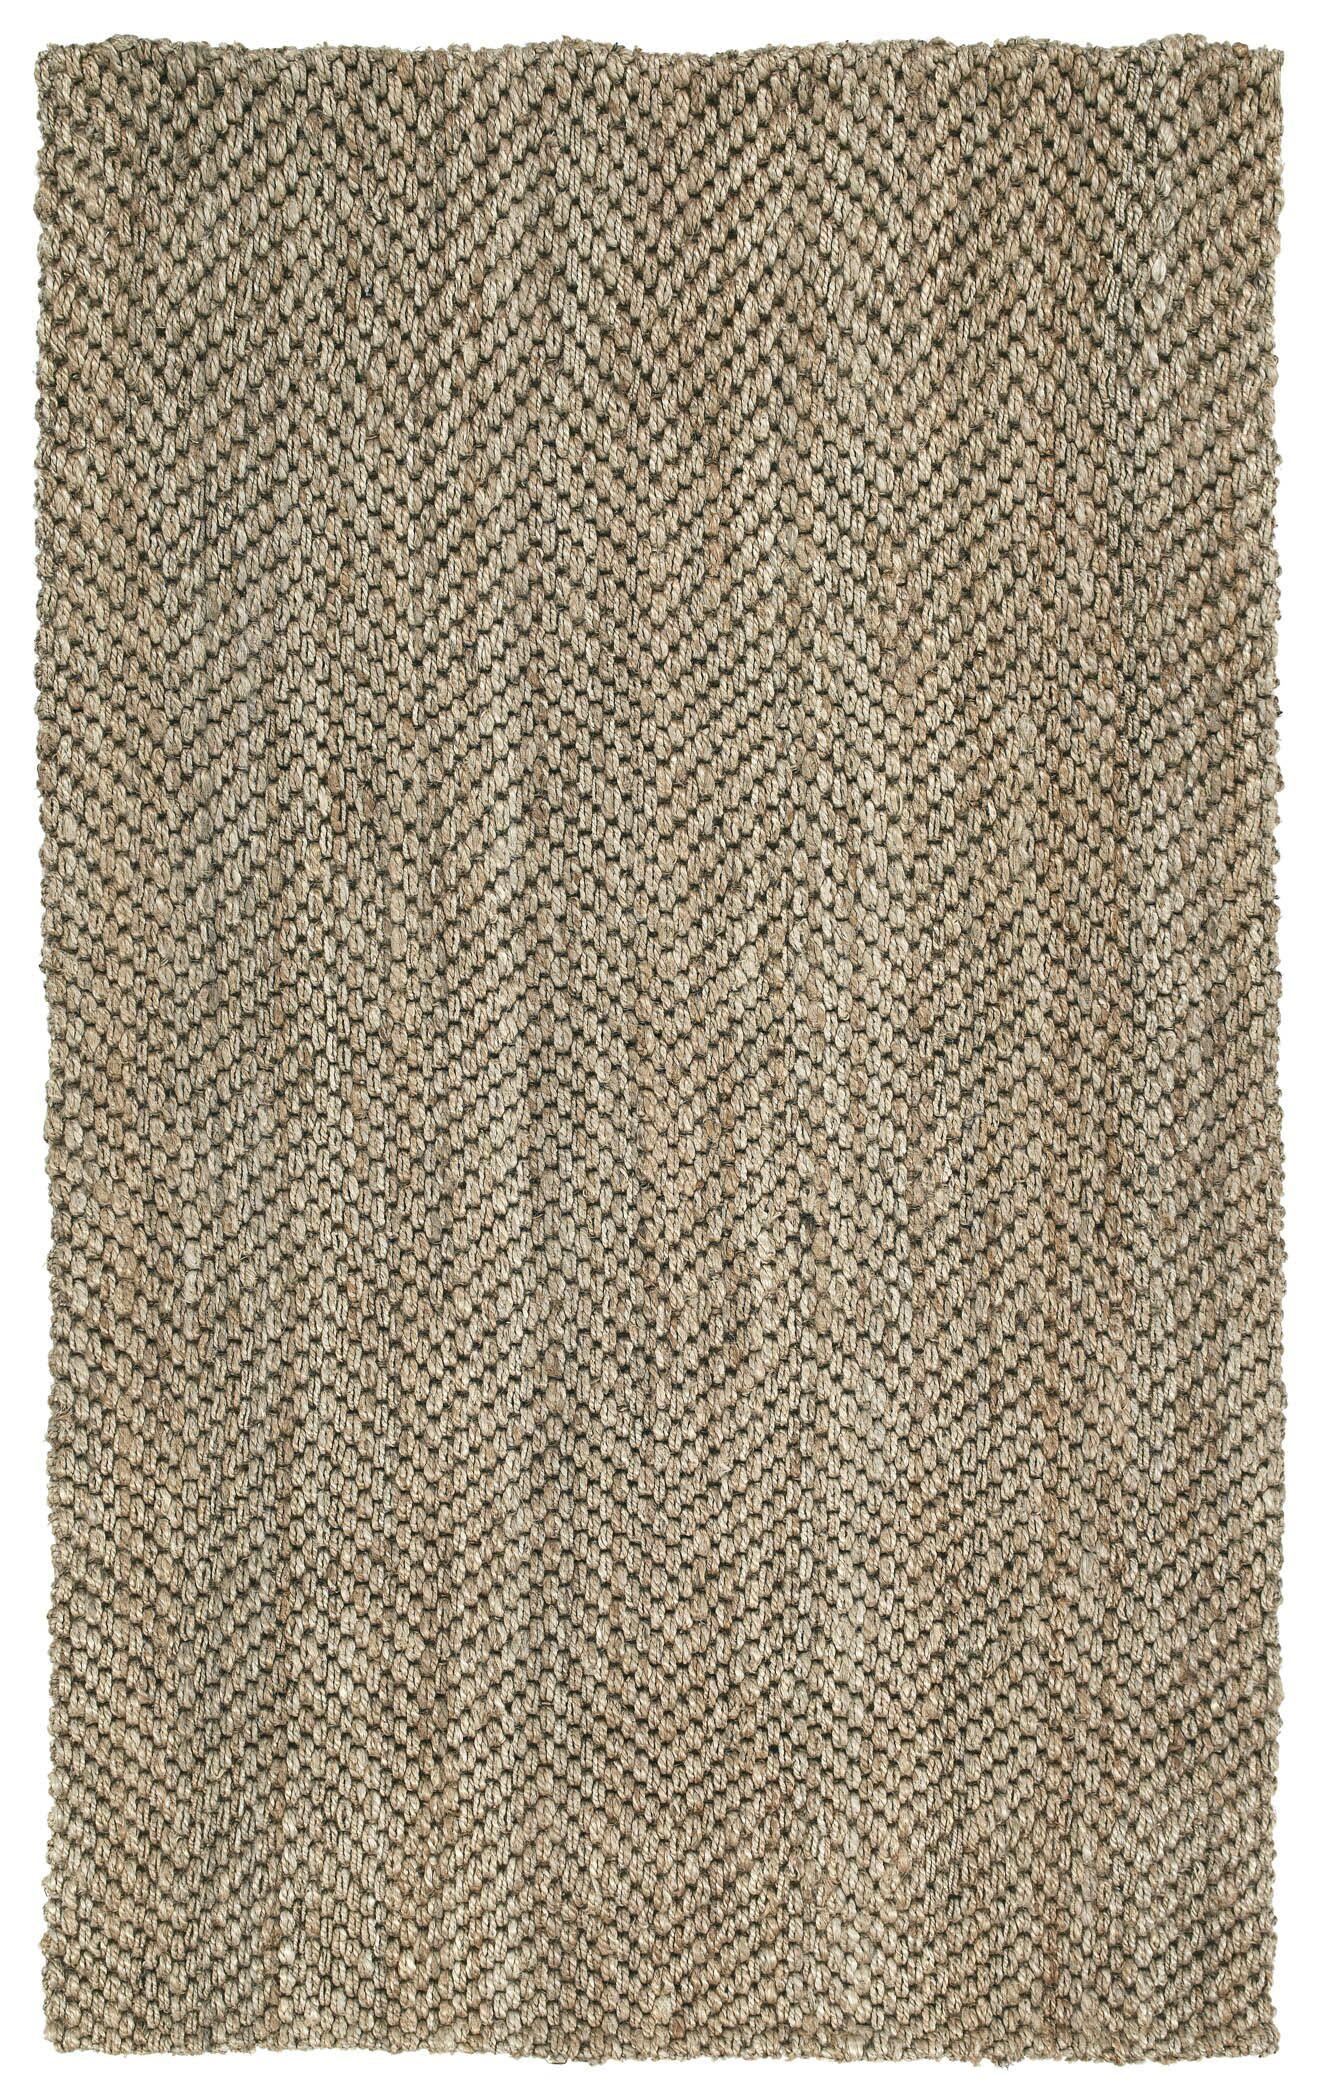 Rose Herringbone Brown Area Rug Rug Size: Rectangle 4' x 6'